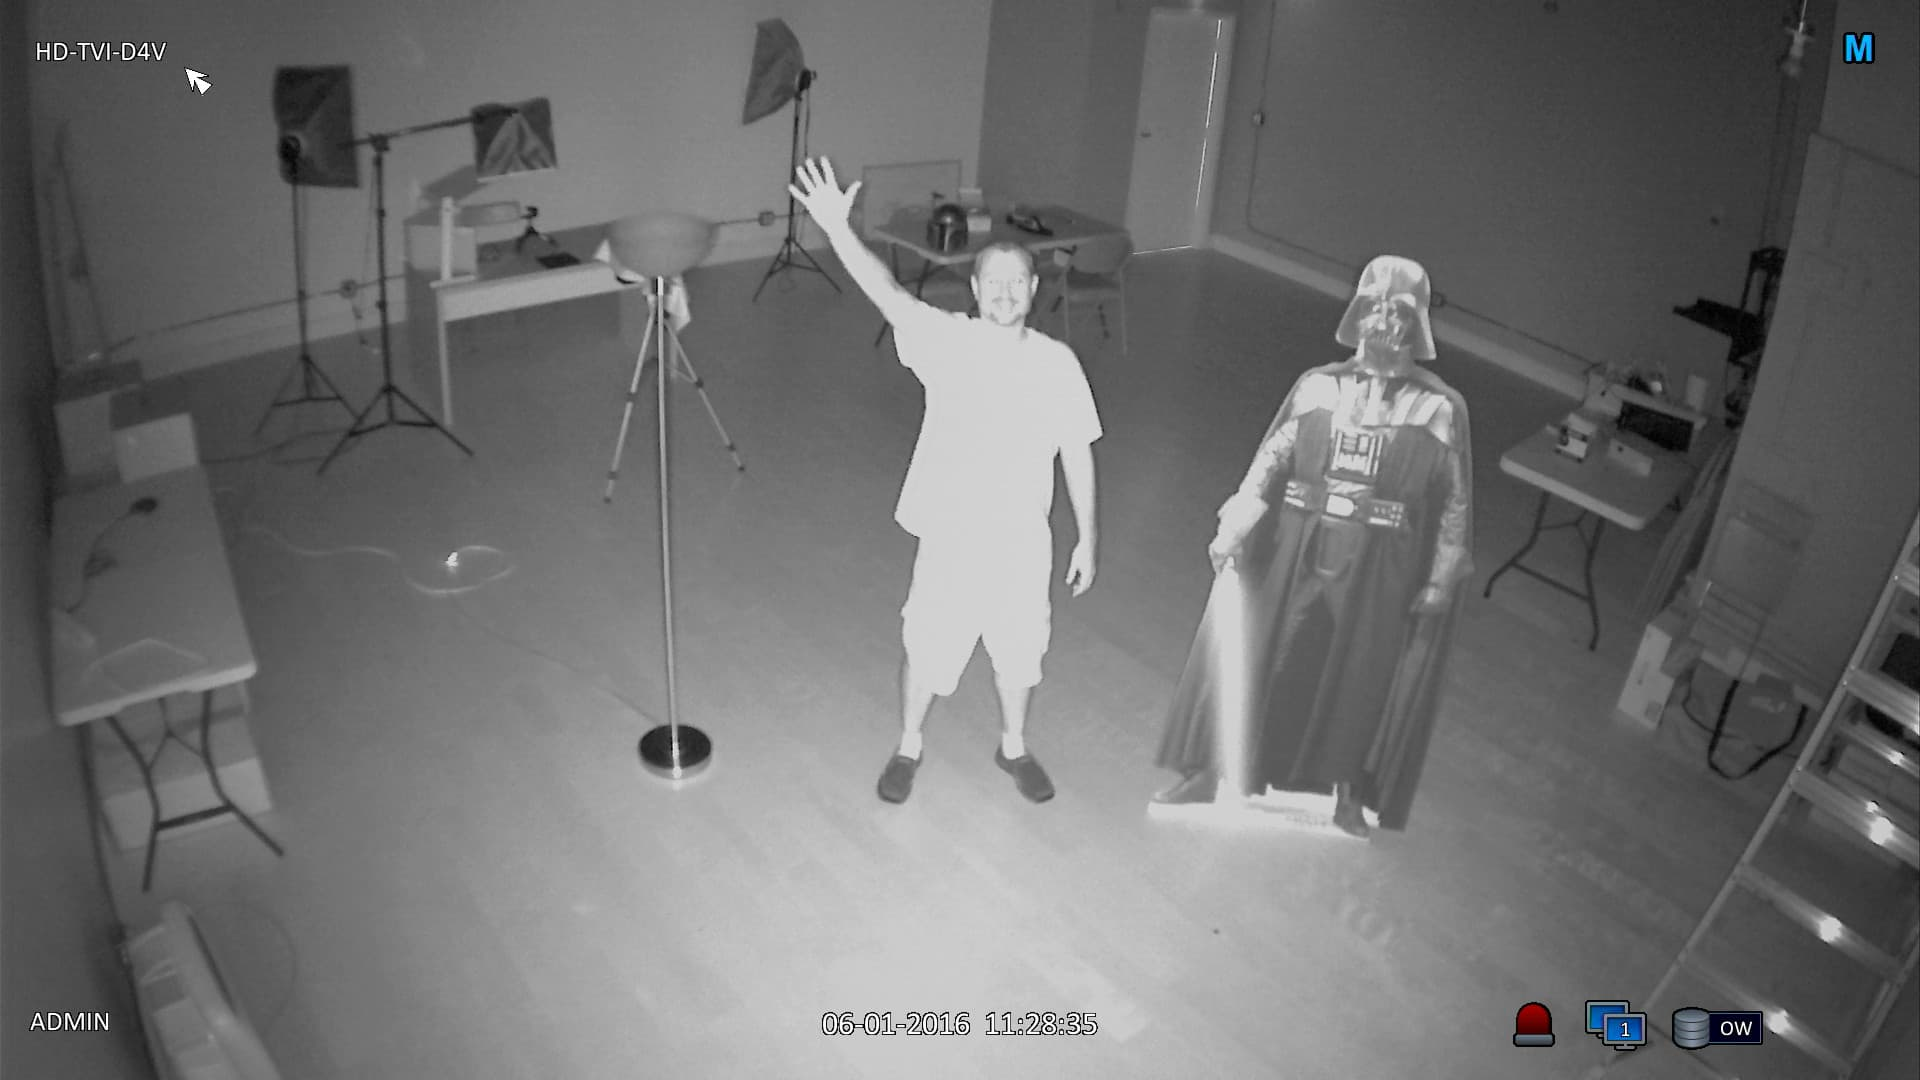 Indoor Dome HD-TVI Camera, 1080p Video, Varifocal Lens, IR